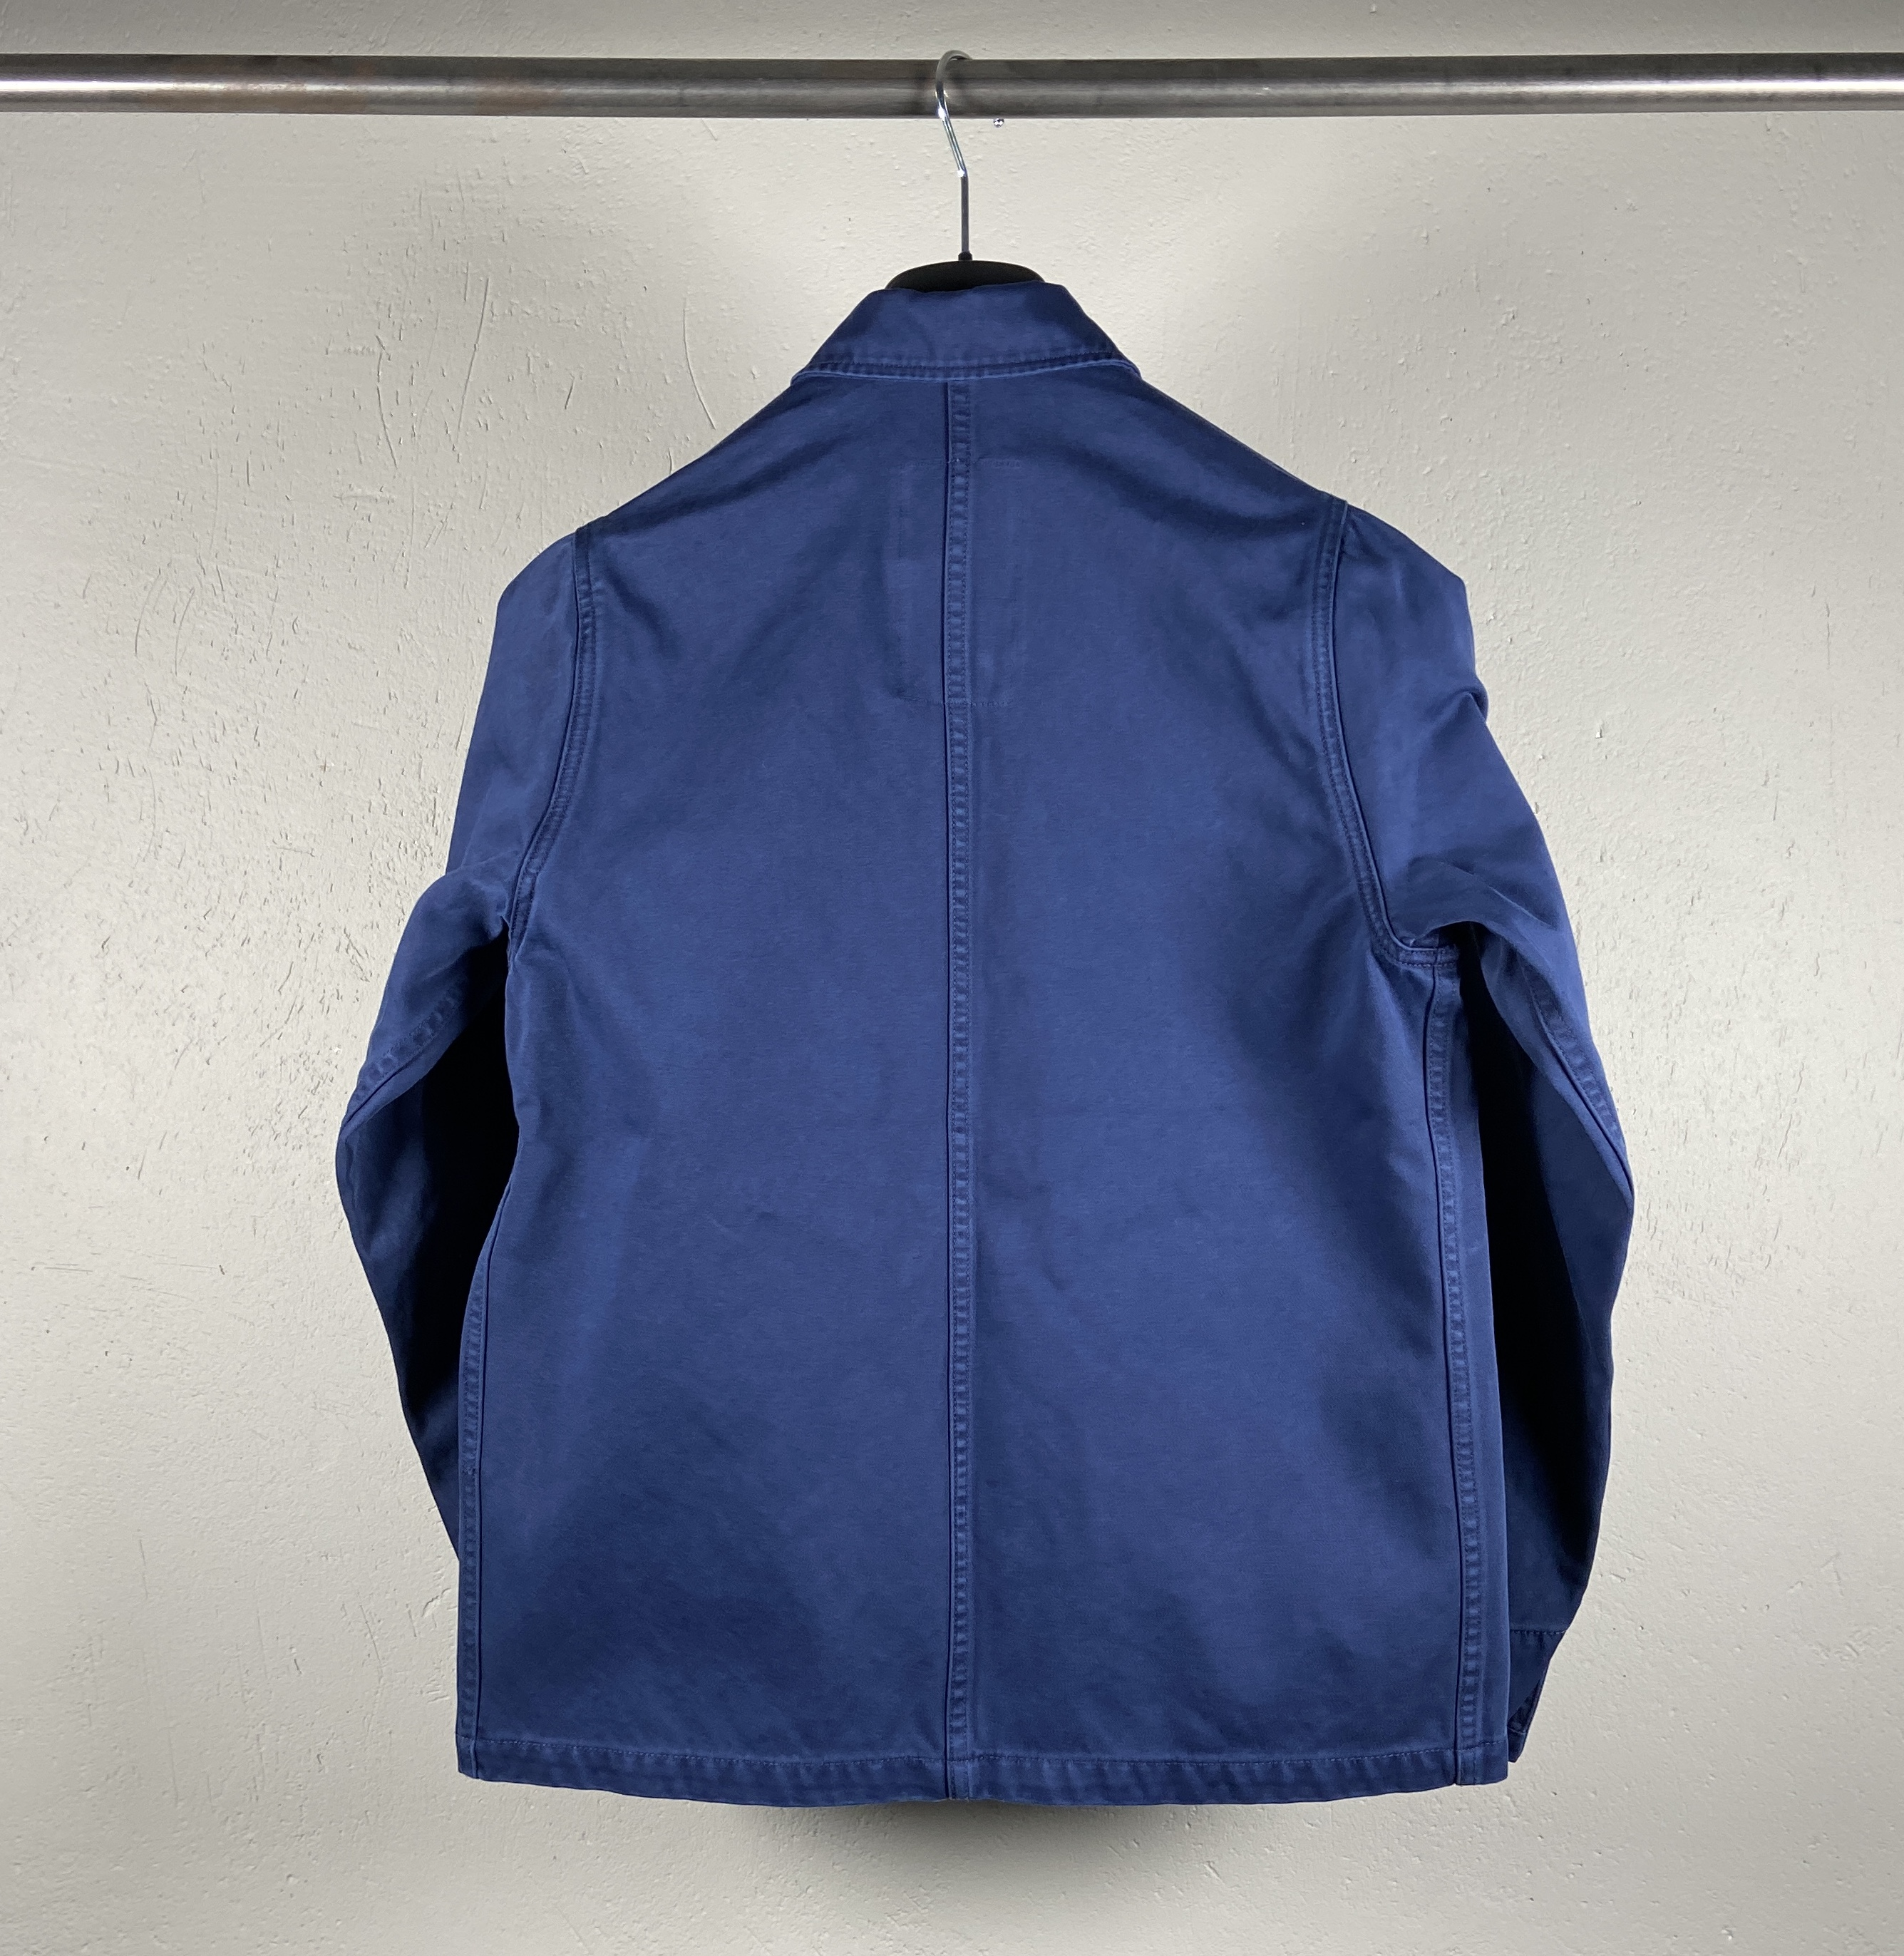 Moleskin hydrone work jacket